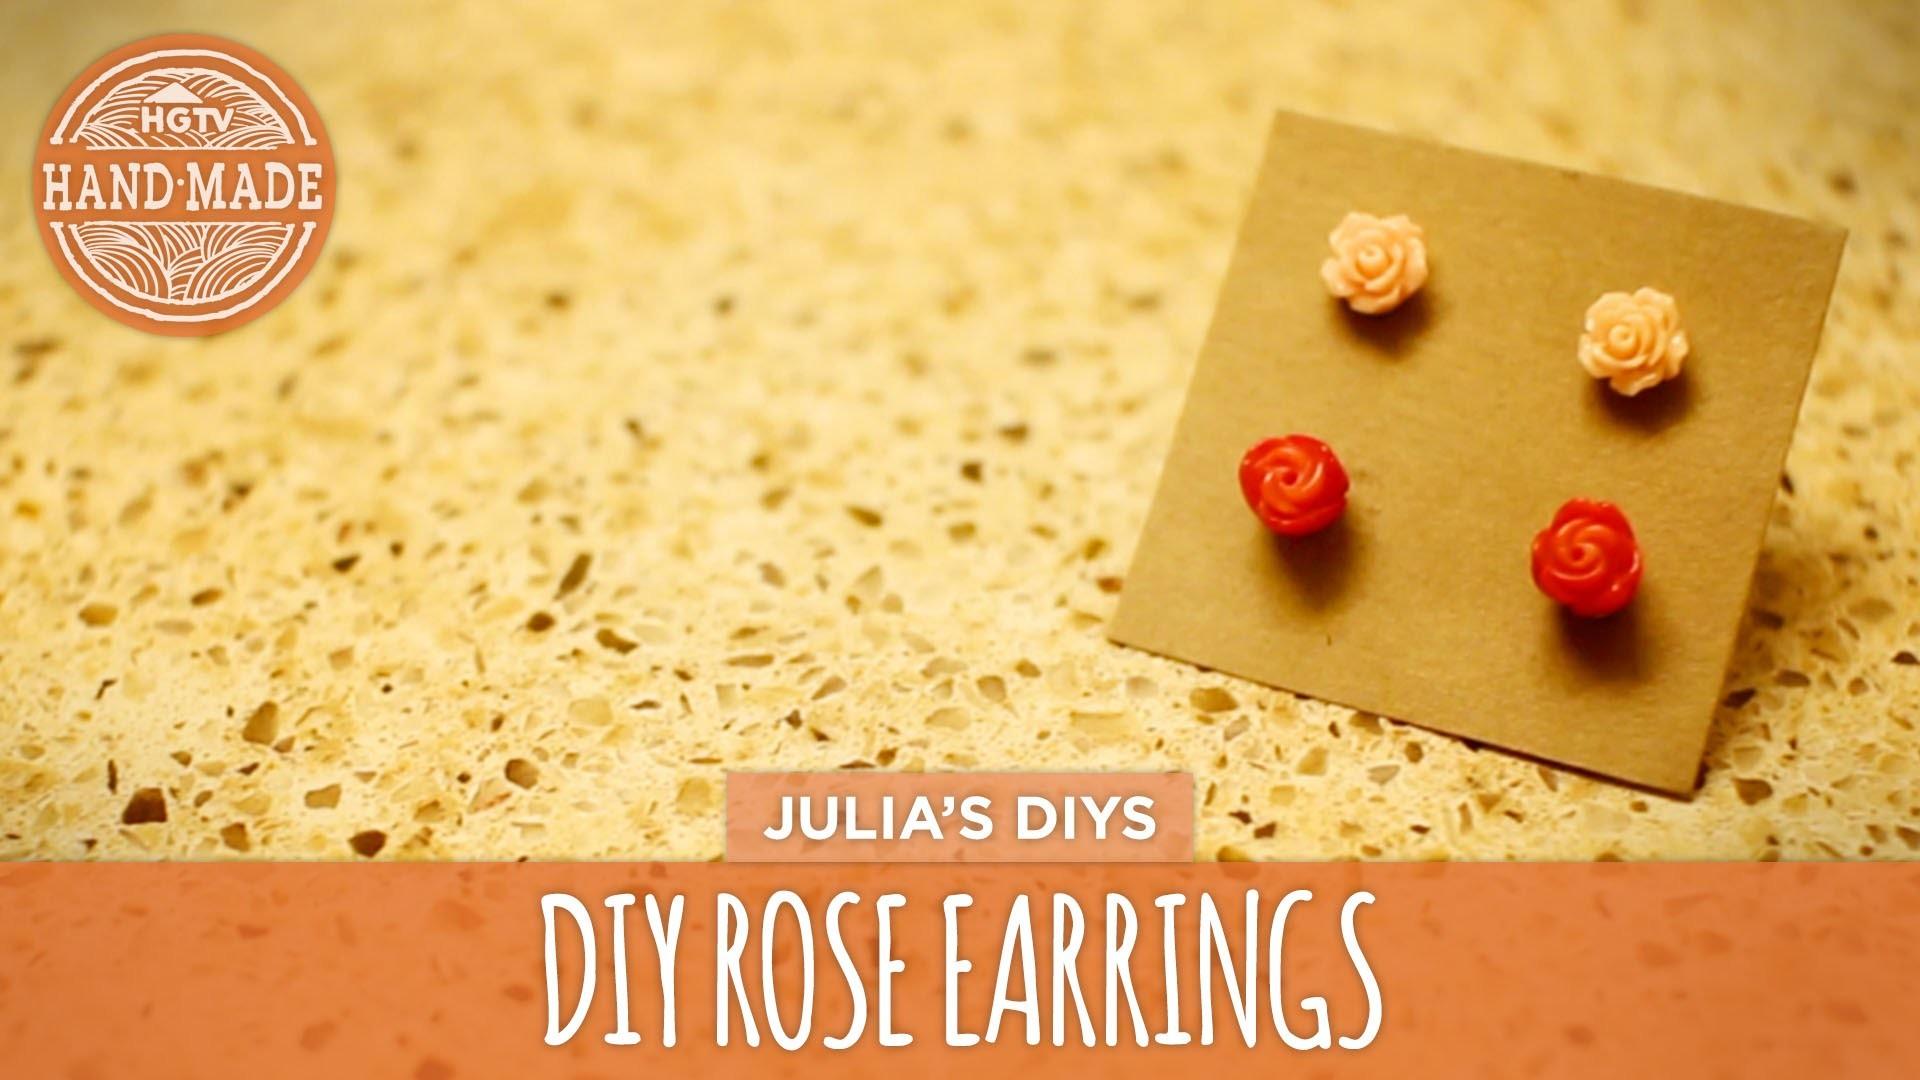 DIY Rose Earrings + Quick Jewelry Storage Tip! - HGTV Handmade